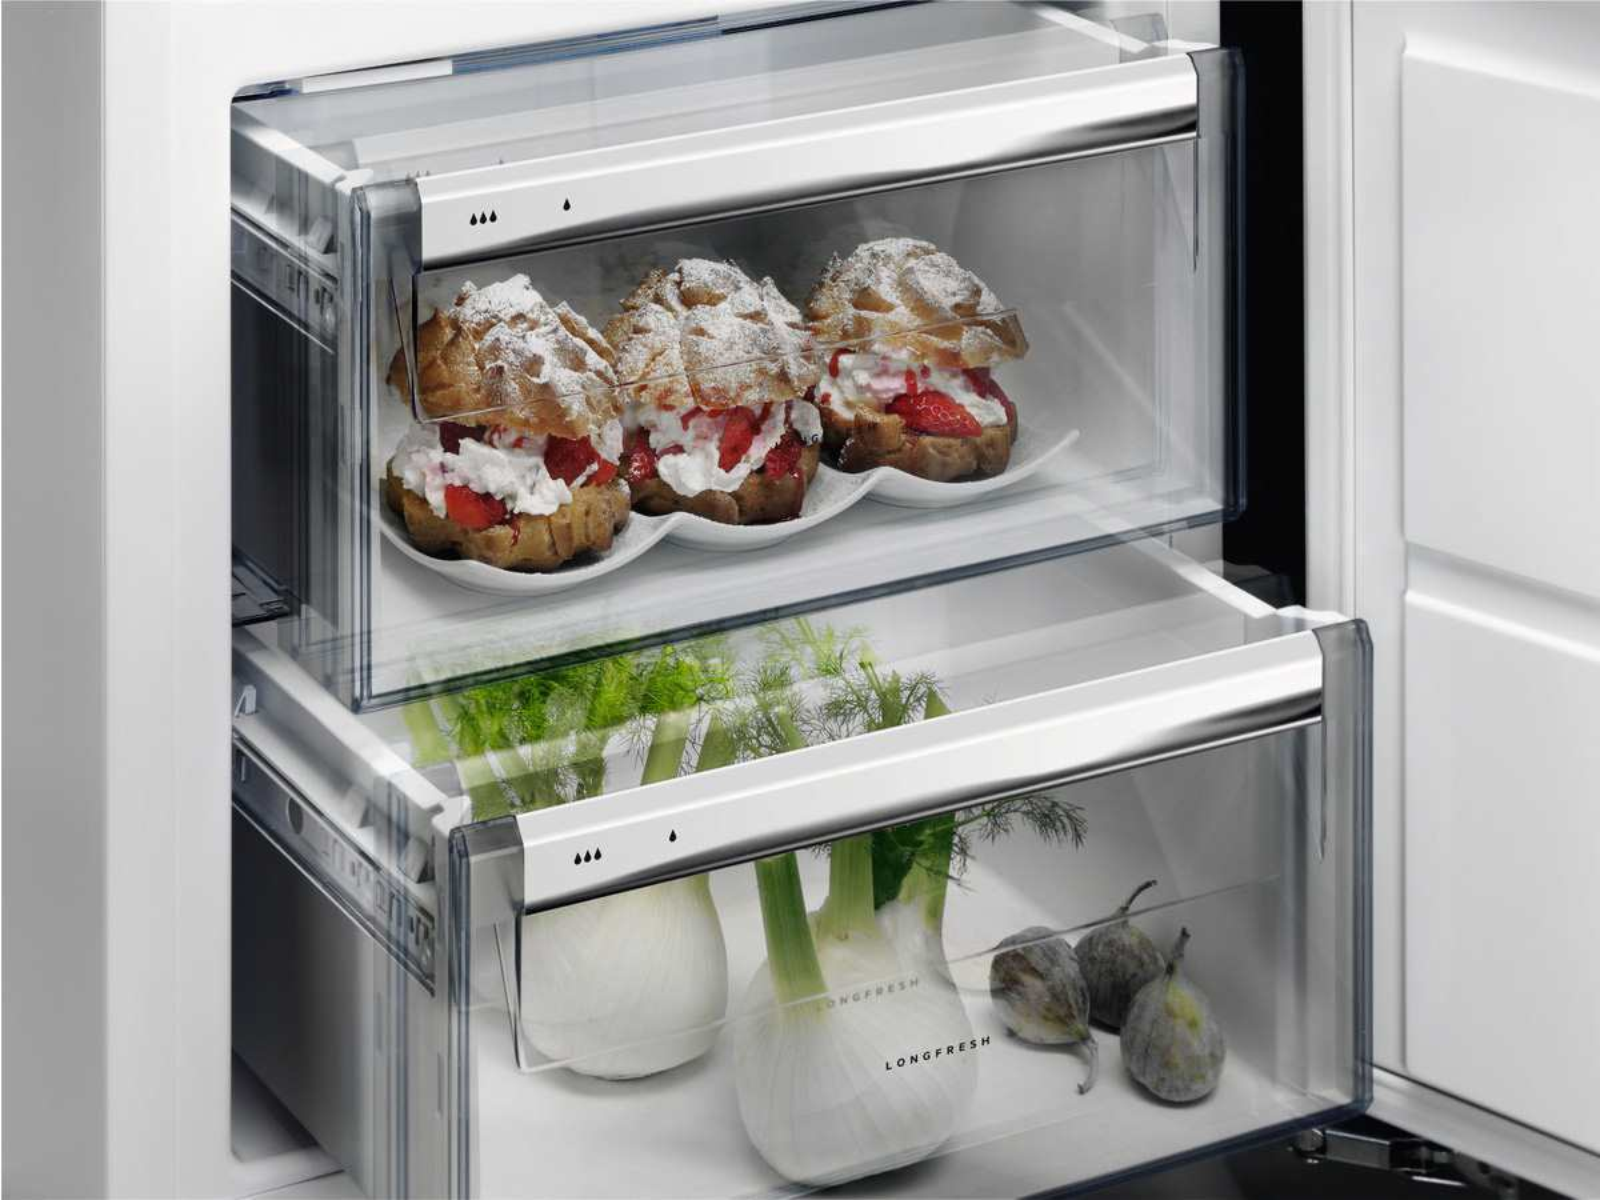 Aeg Kühlschrank Einschalten : Aeg fsb z vollintegrierbarer einbaugeschirrspüler